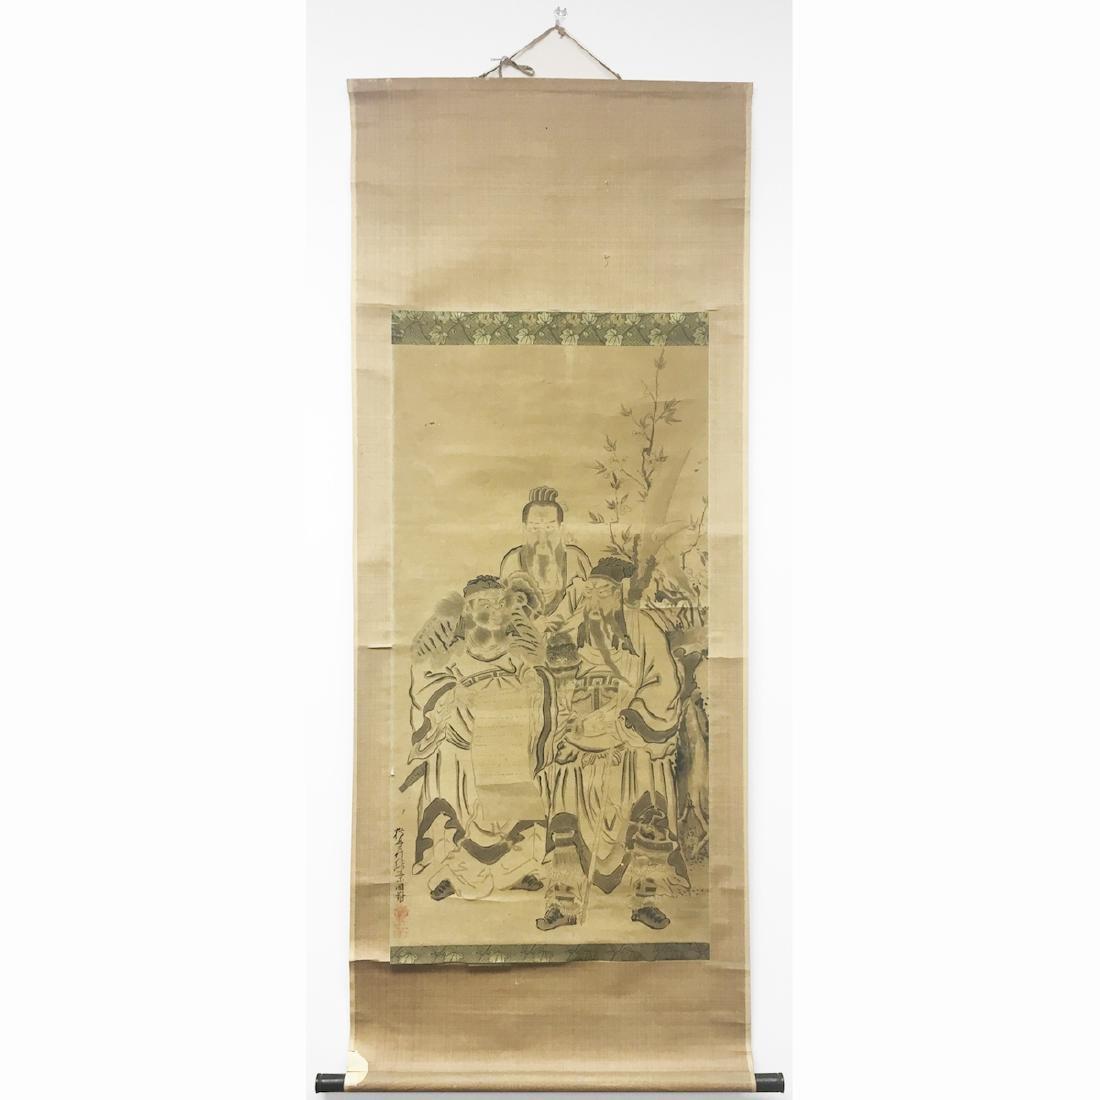 Japanese Scroll of Three Chinese Scholars